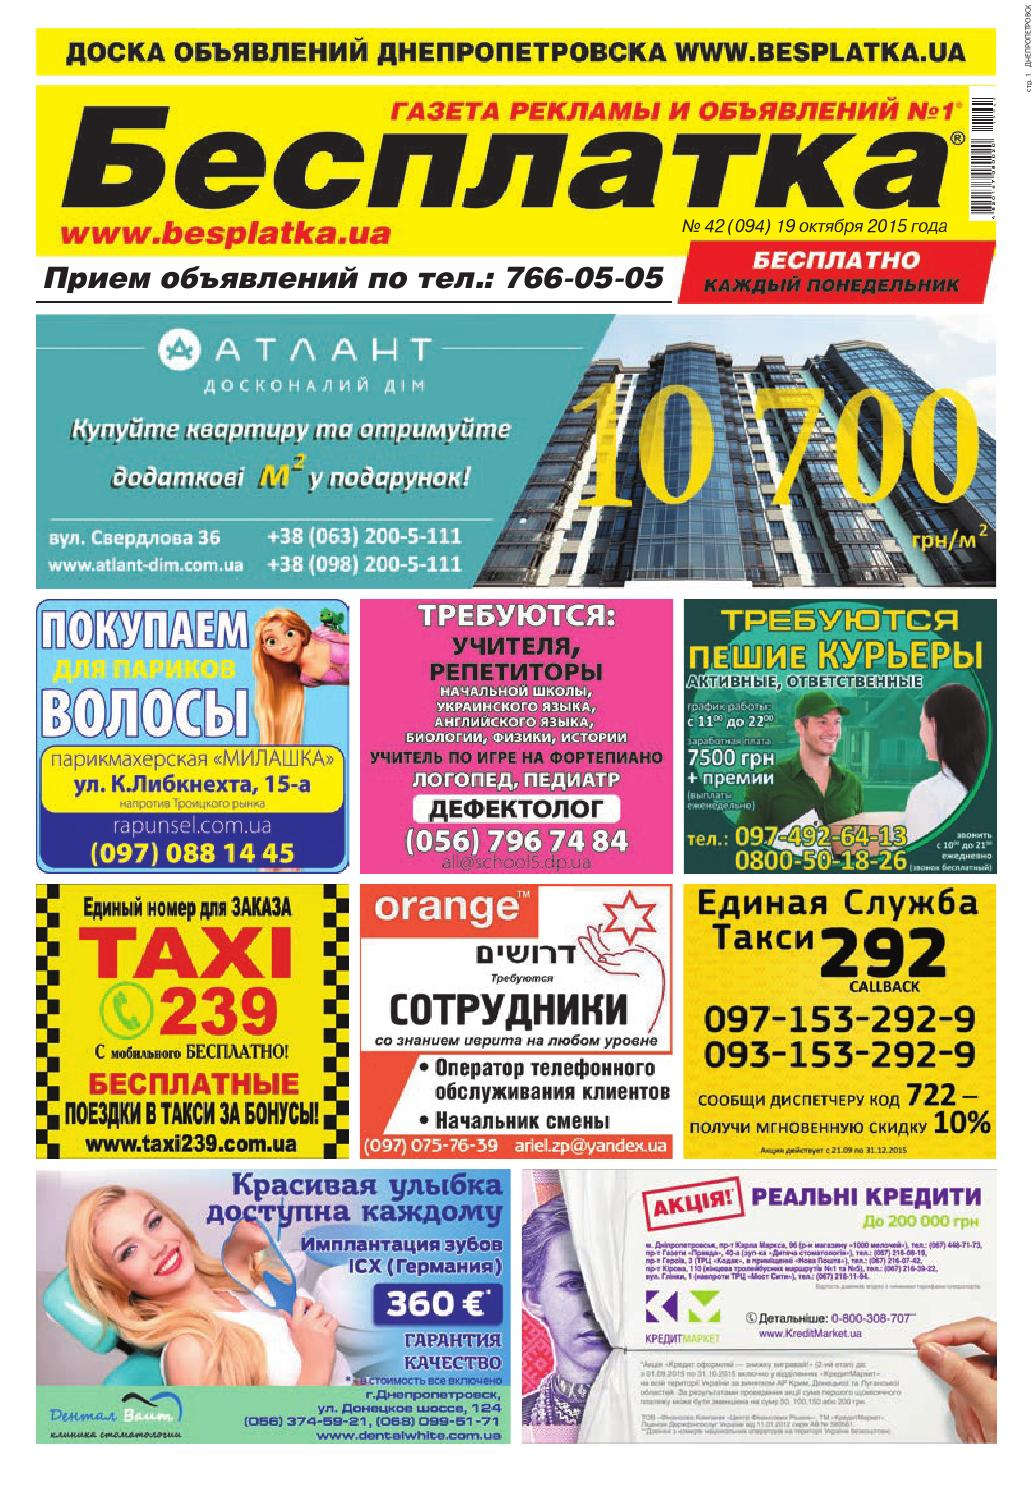 Besplatka  42 Днепропетровск by besplatka ukraine - issuu b8afc77461faf